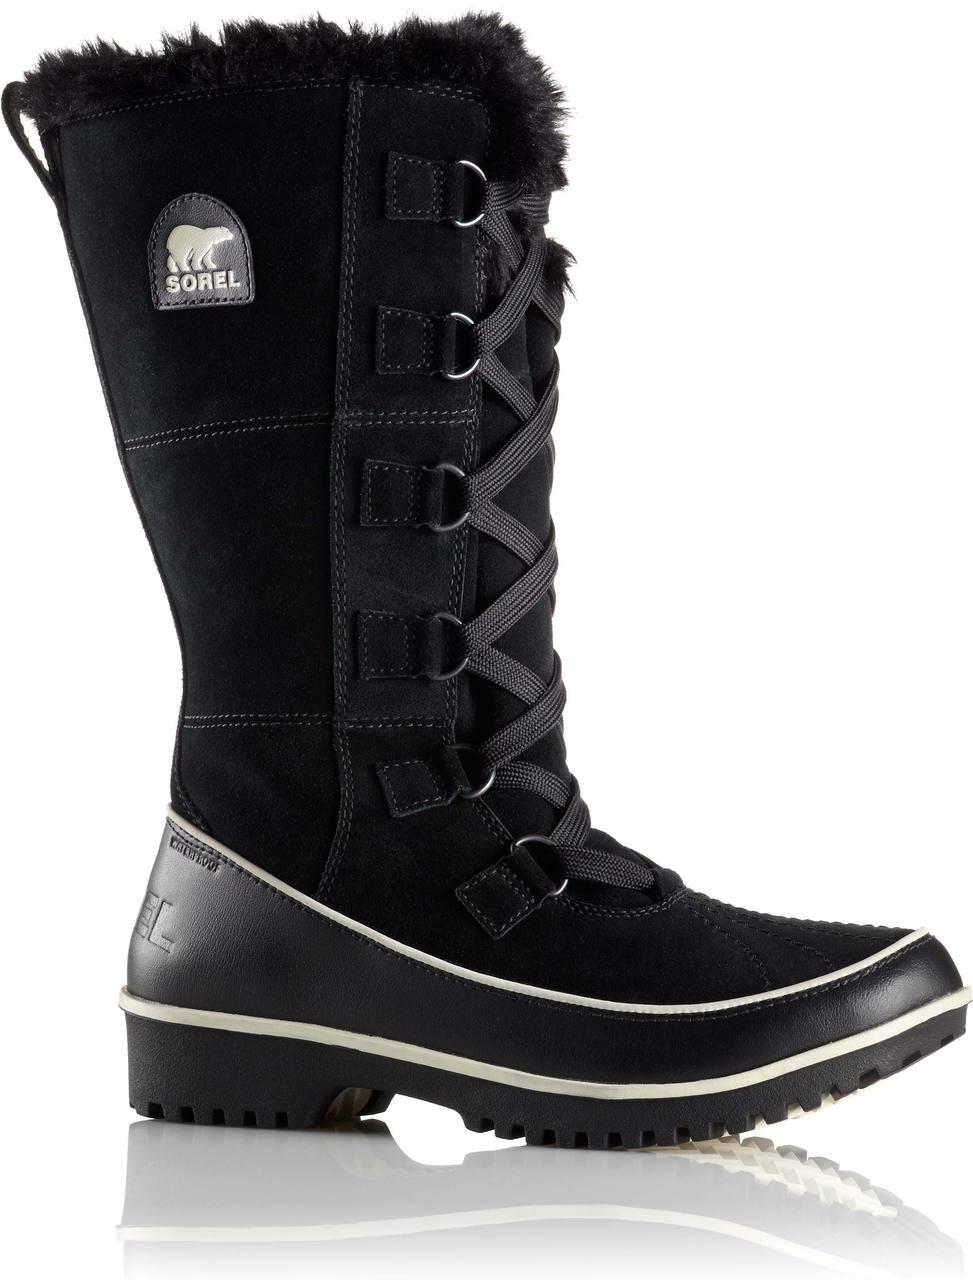 Home · Women's Clearance Shoes · Boots; Sorel Women's Tivoli High II. Black